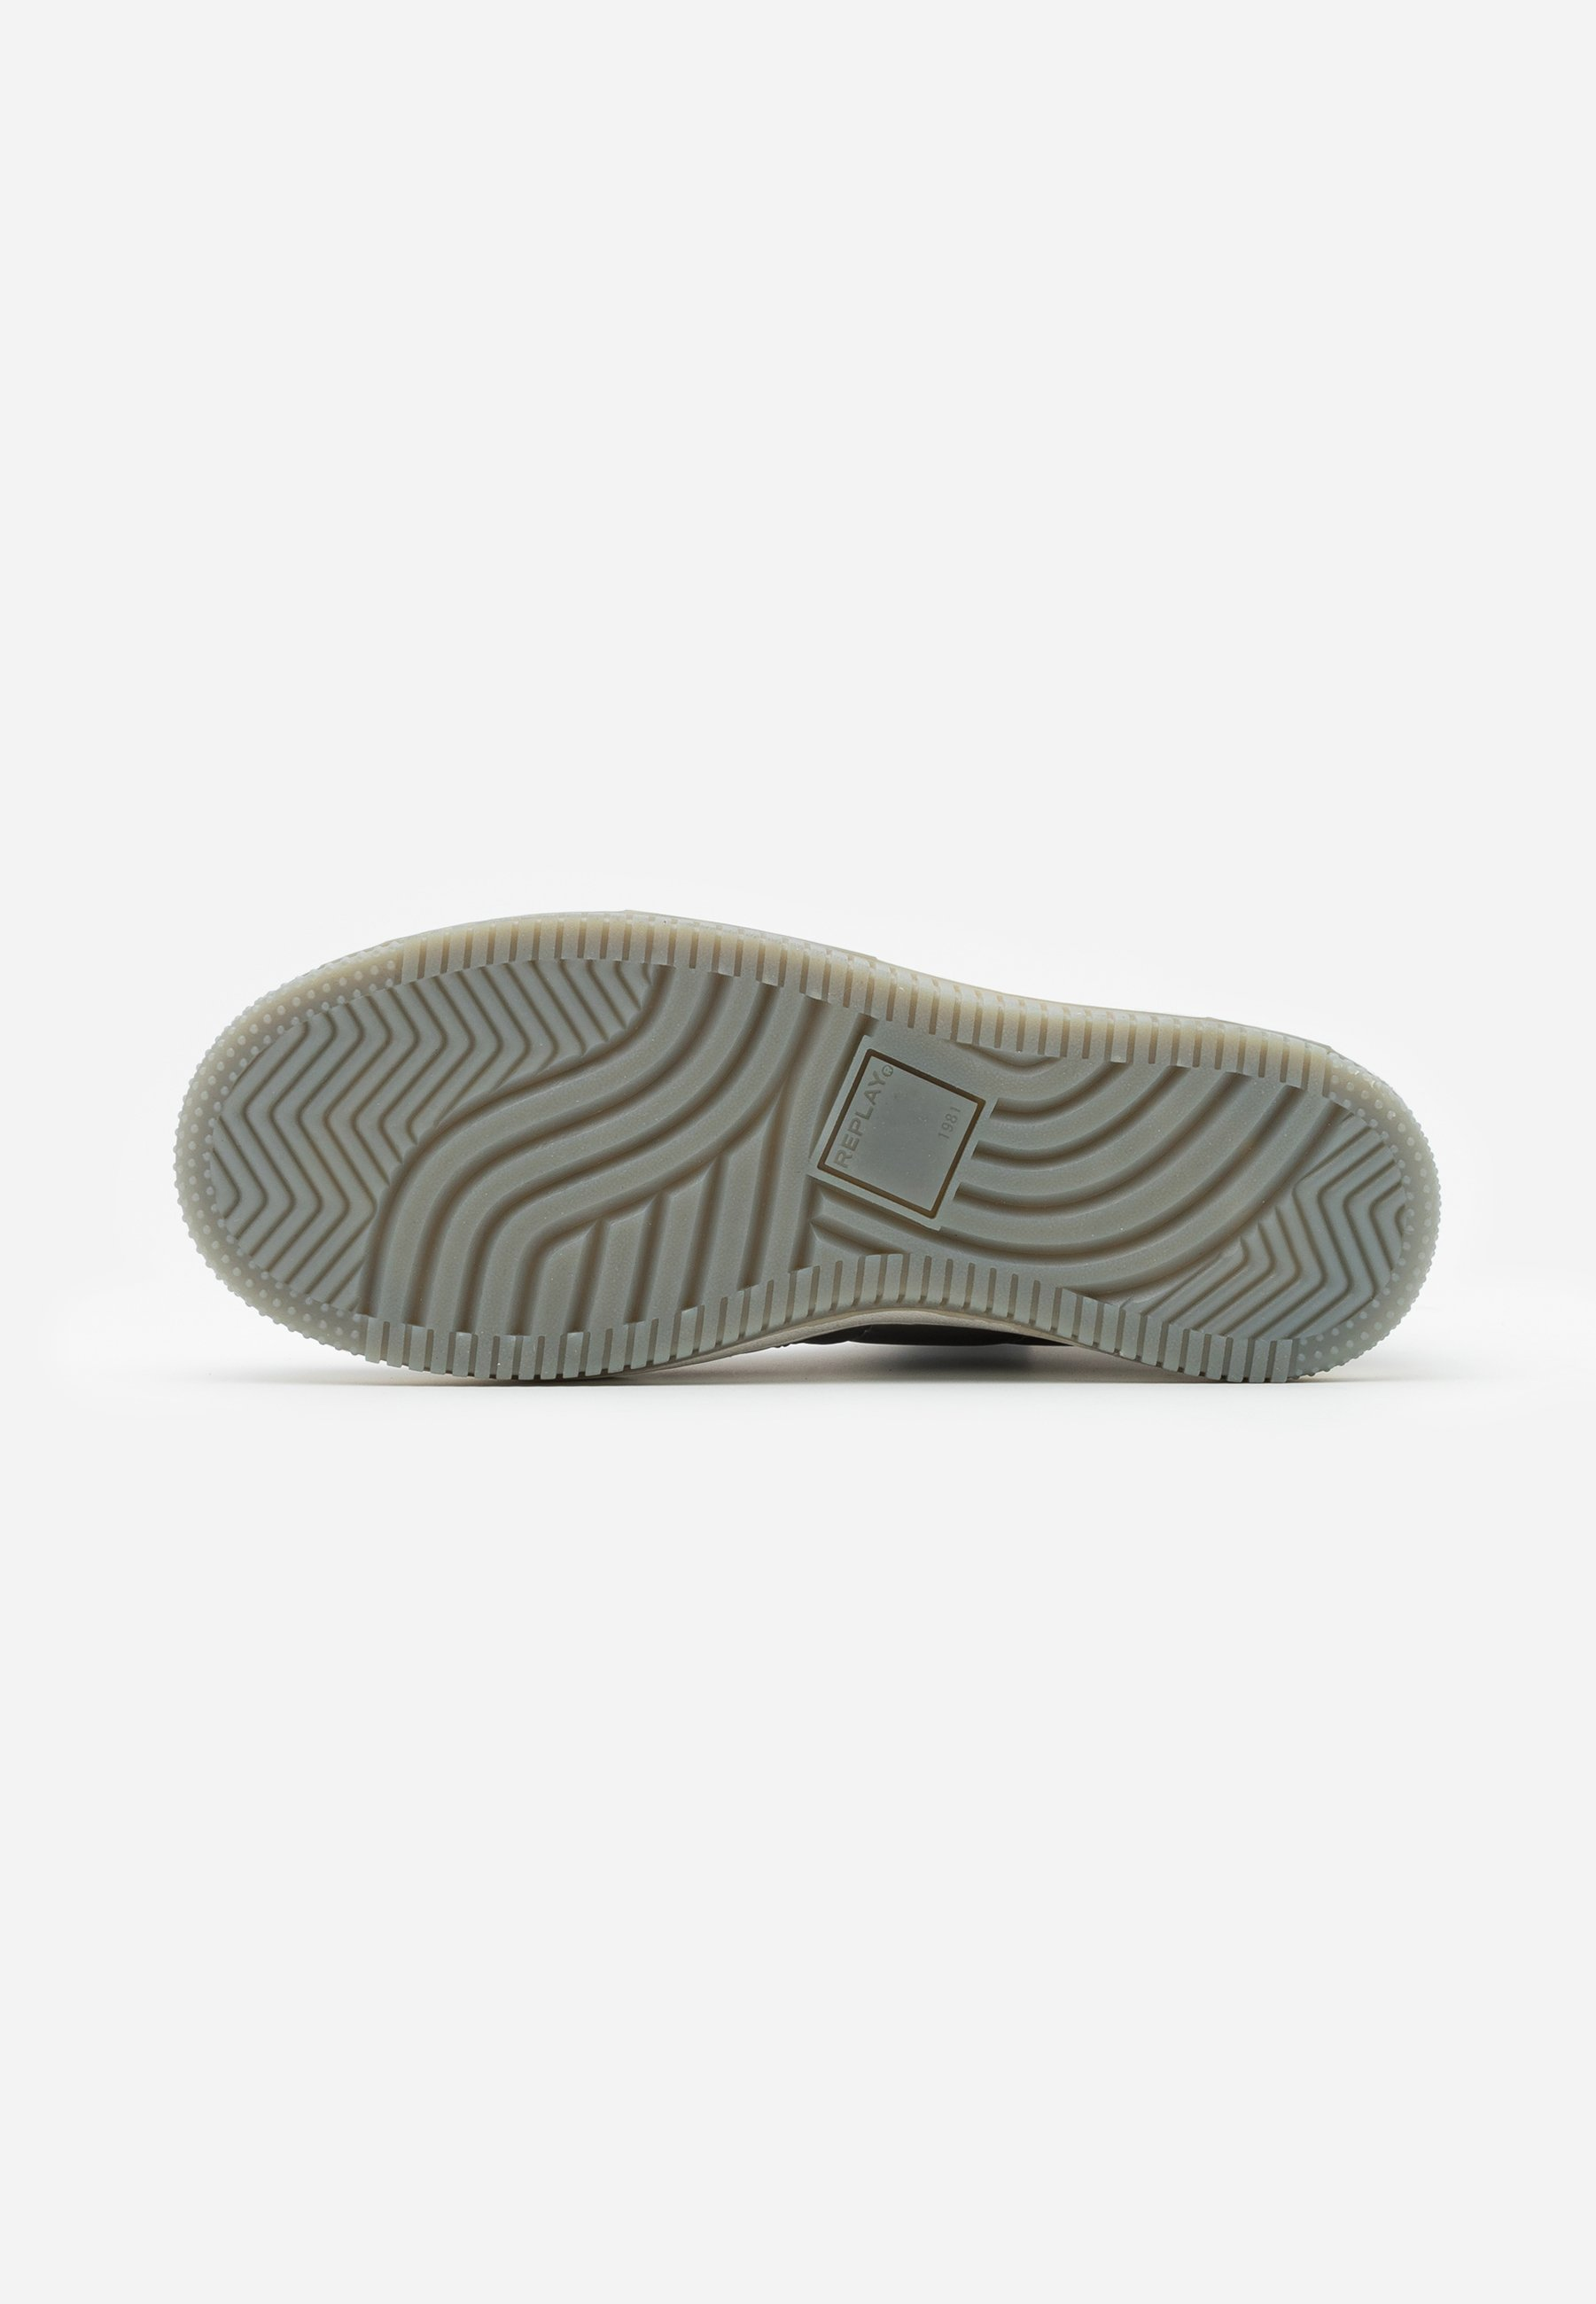 Replay EPIC ENDURANCE Sneaker high dark silver/silber